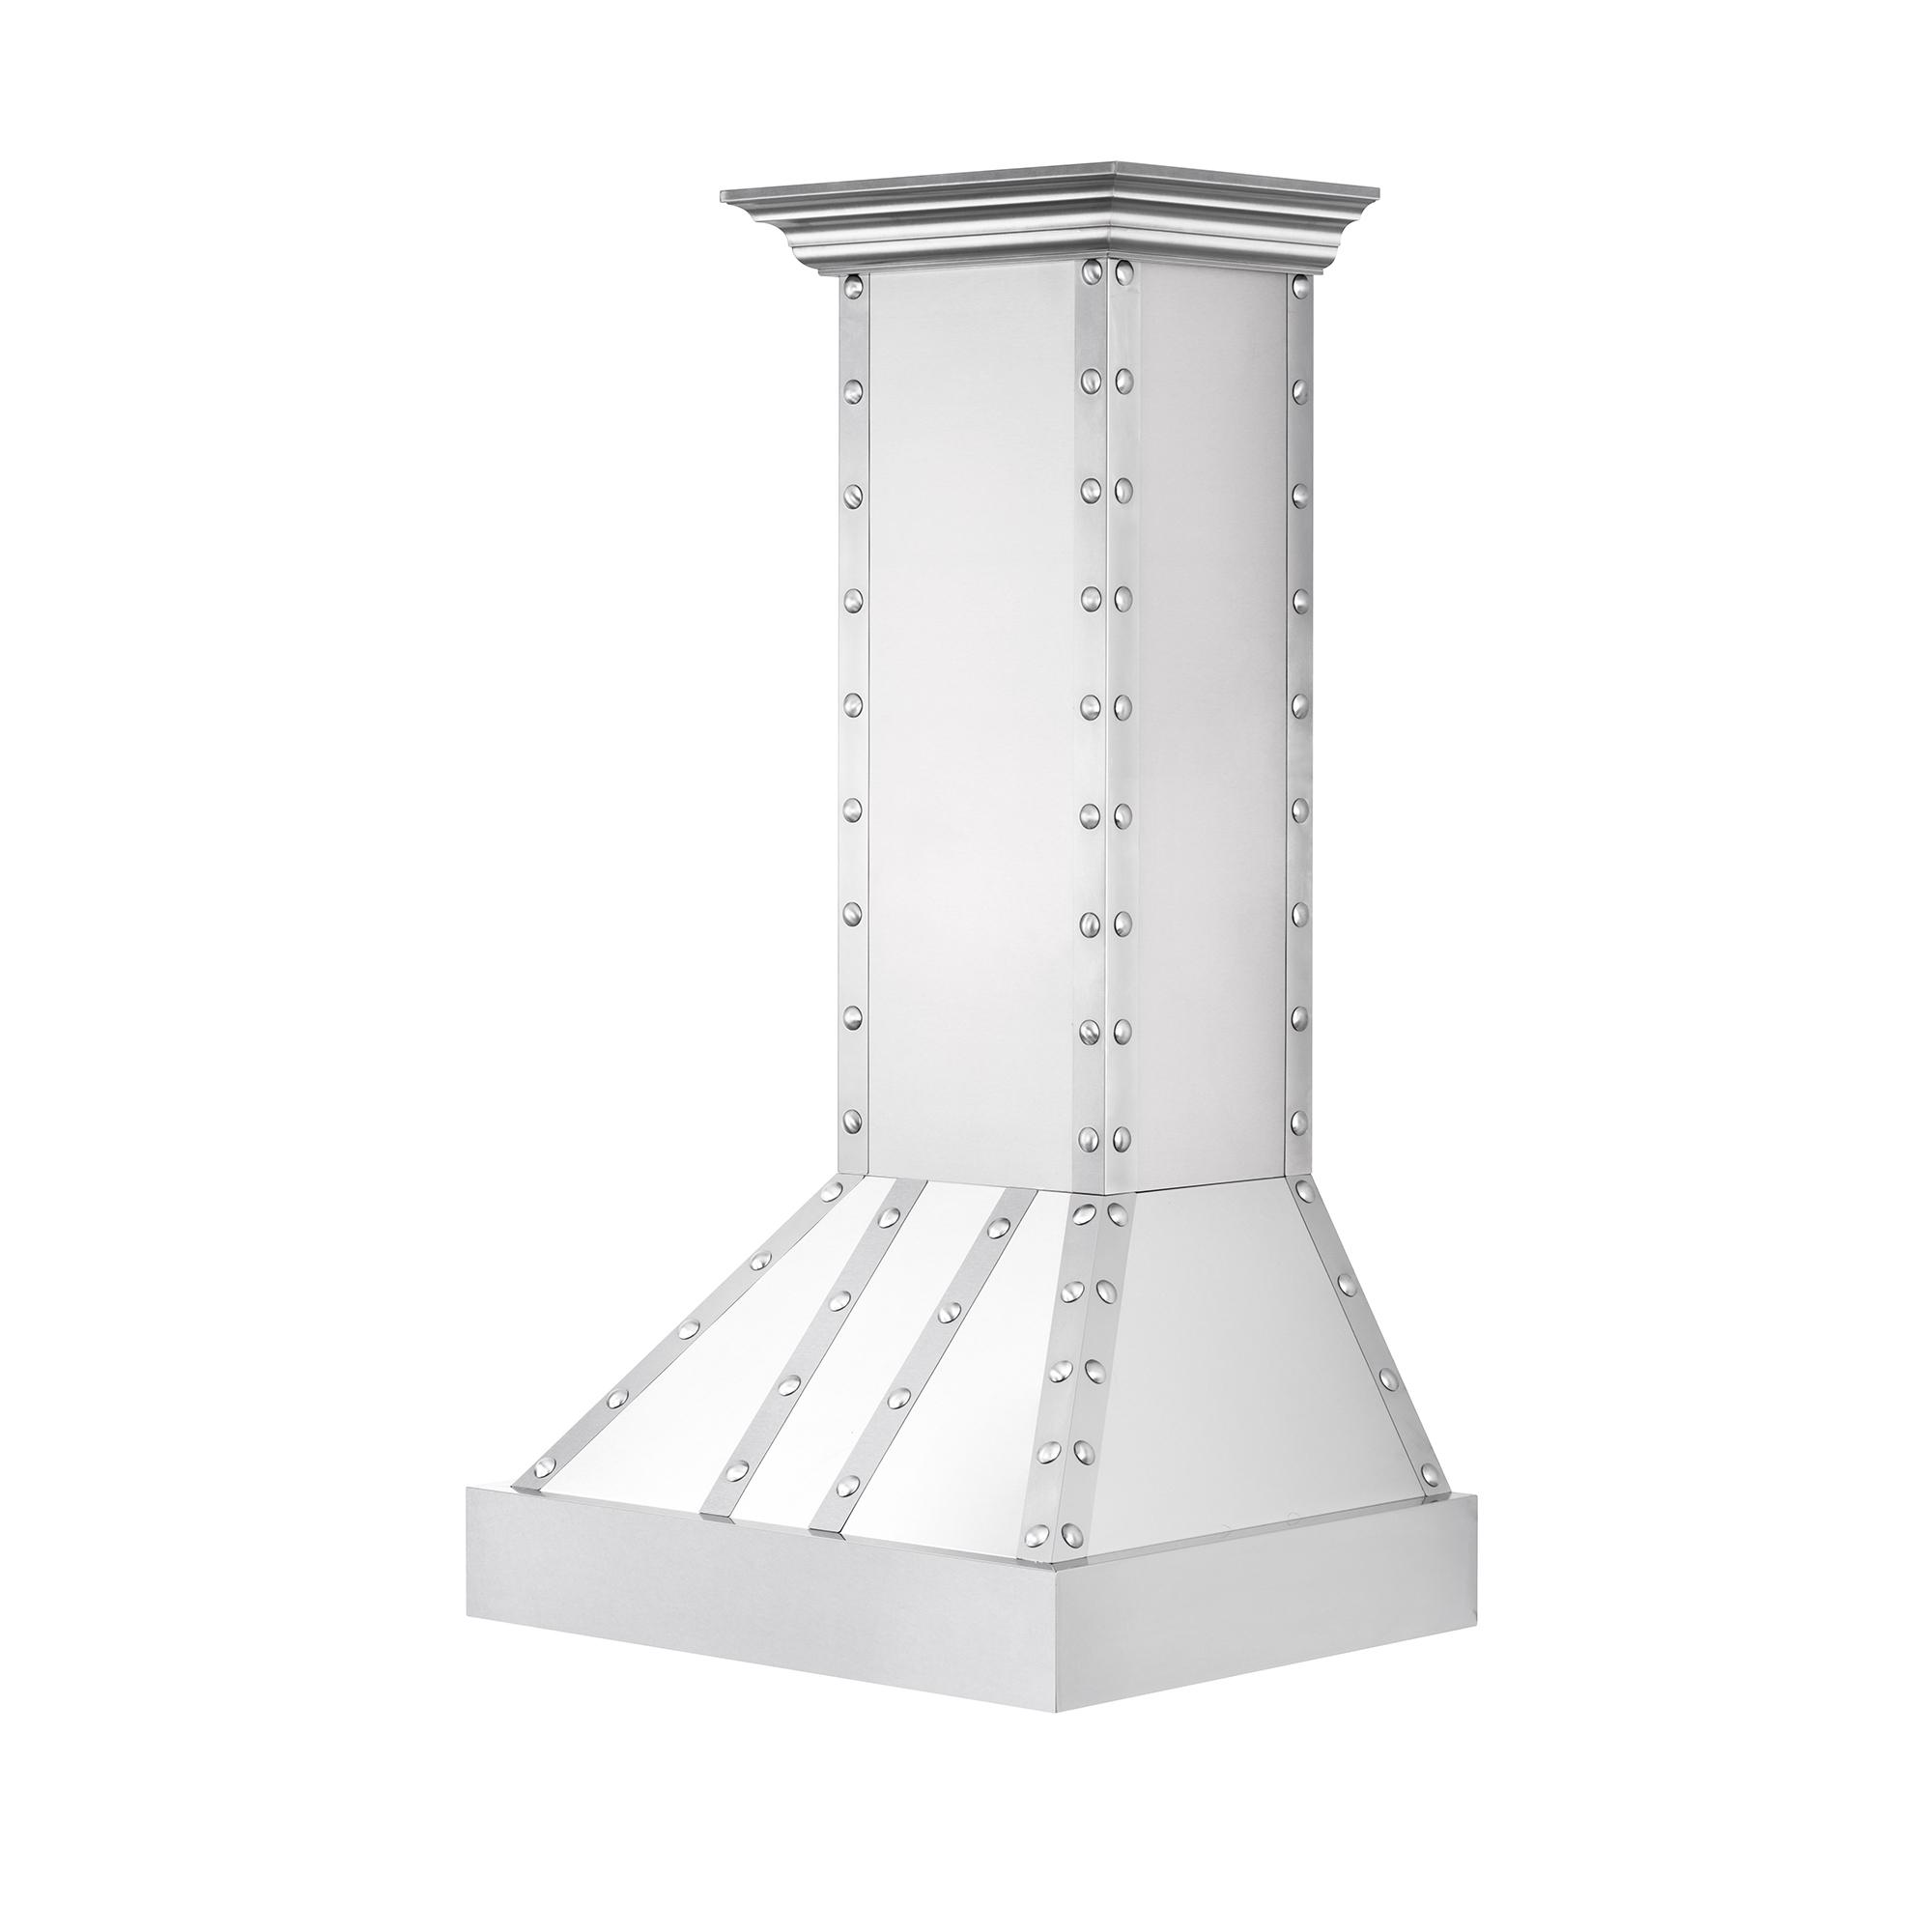 zline-stainless-steel-wall-mounted-range-hood-655-4SSSS-main.jpg